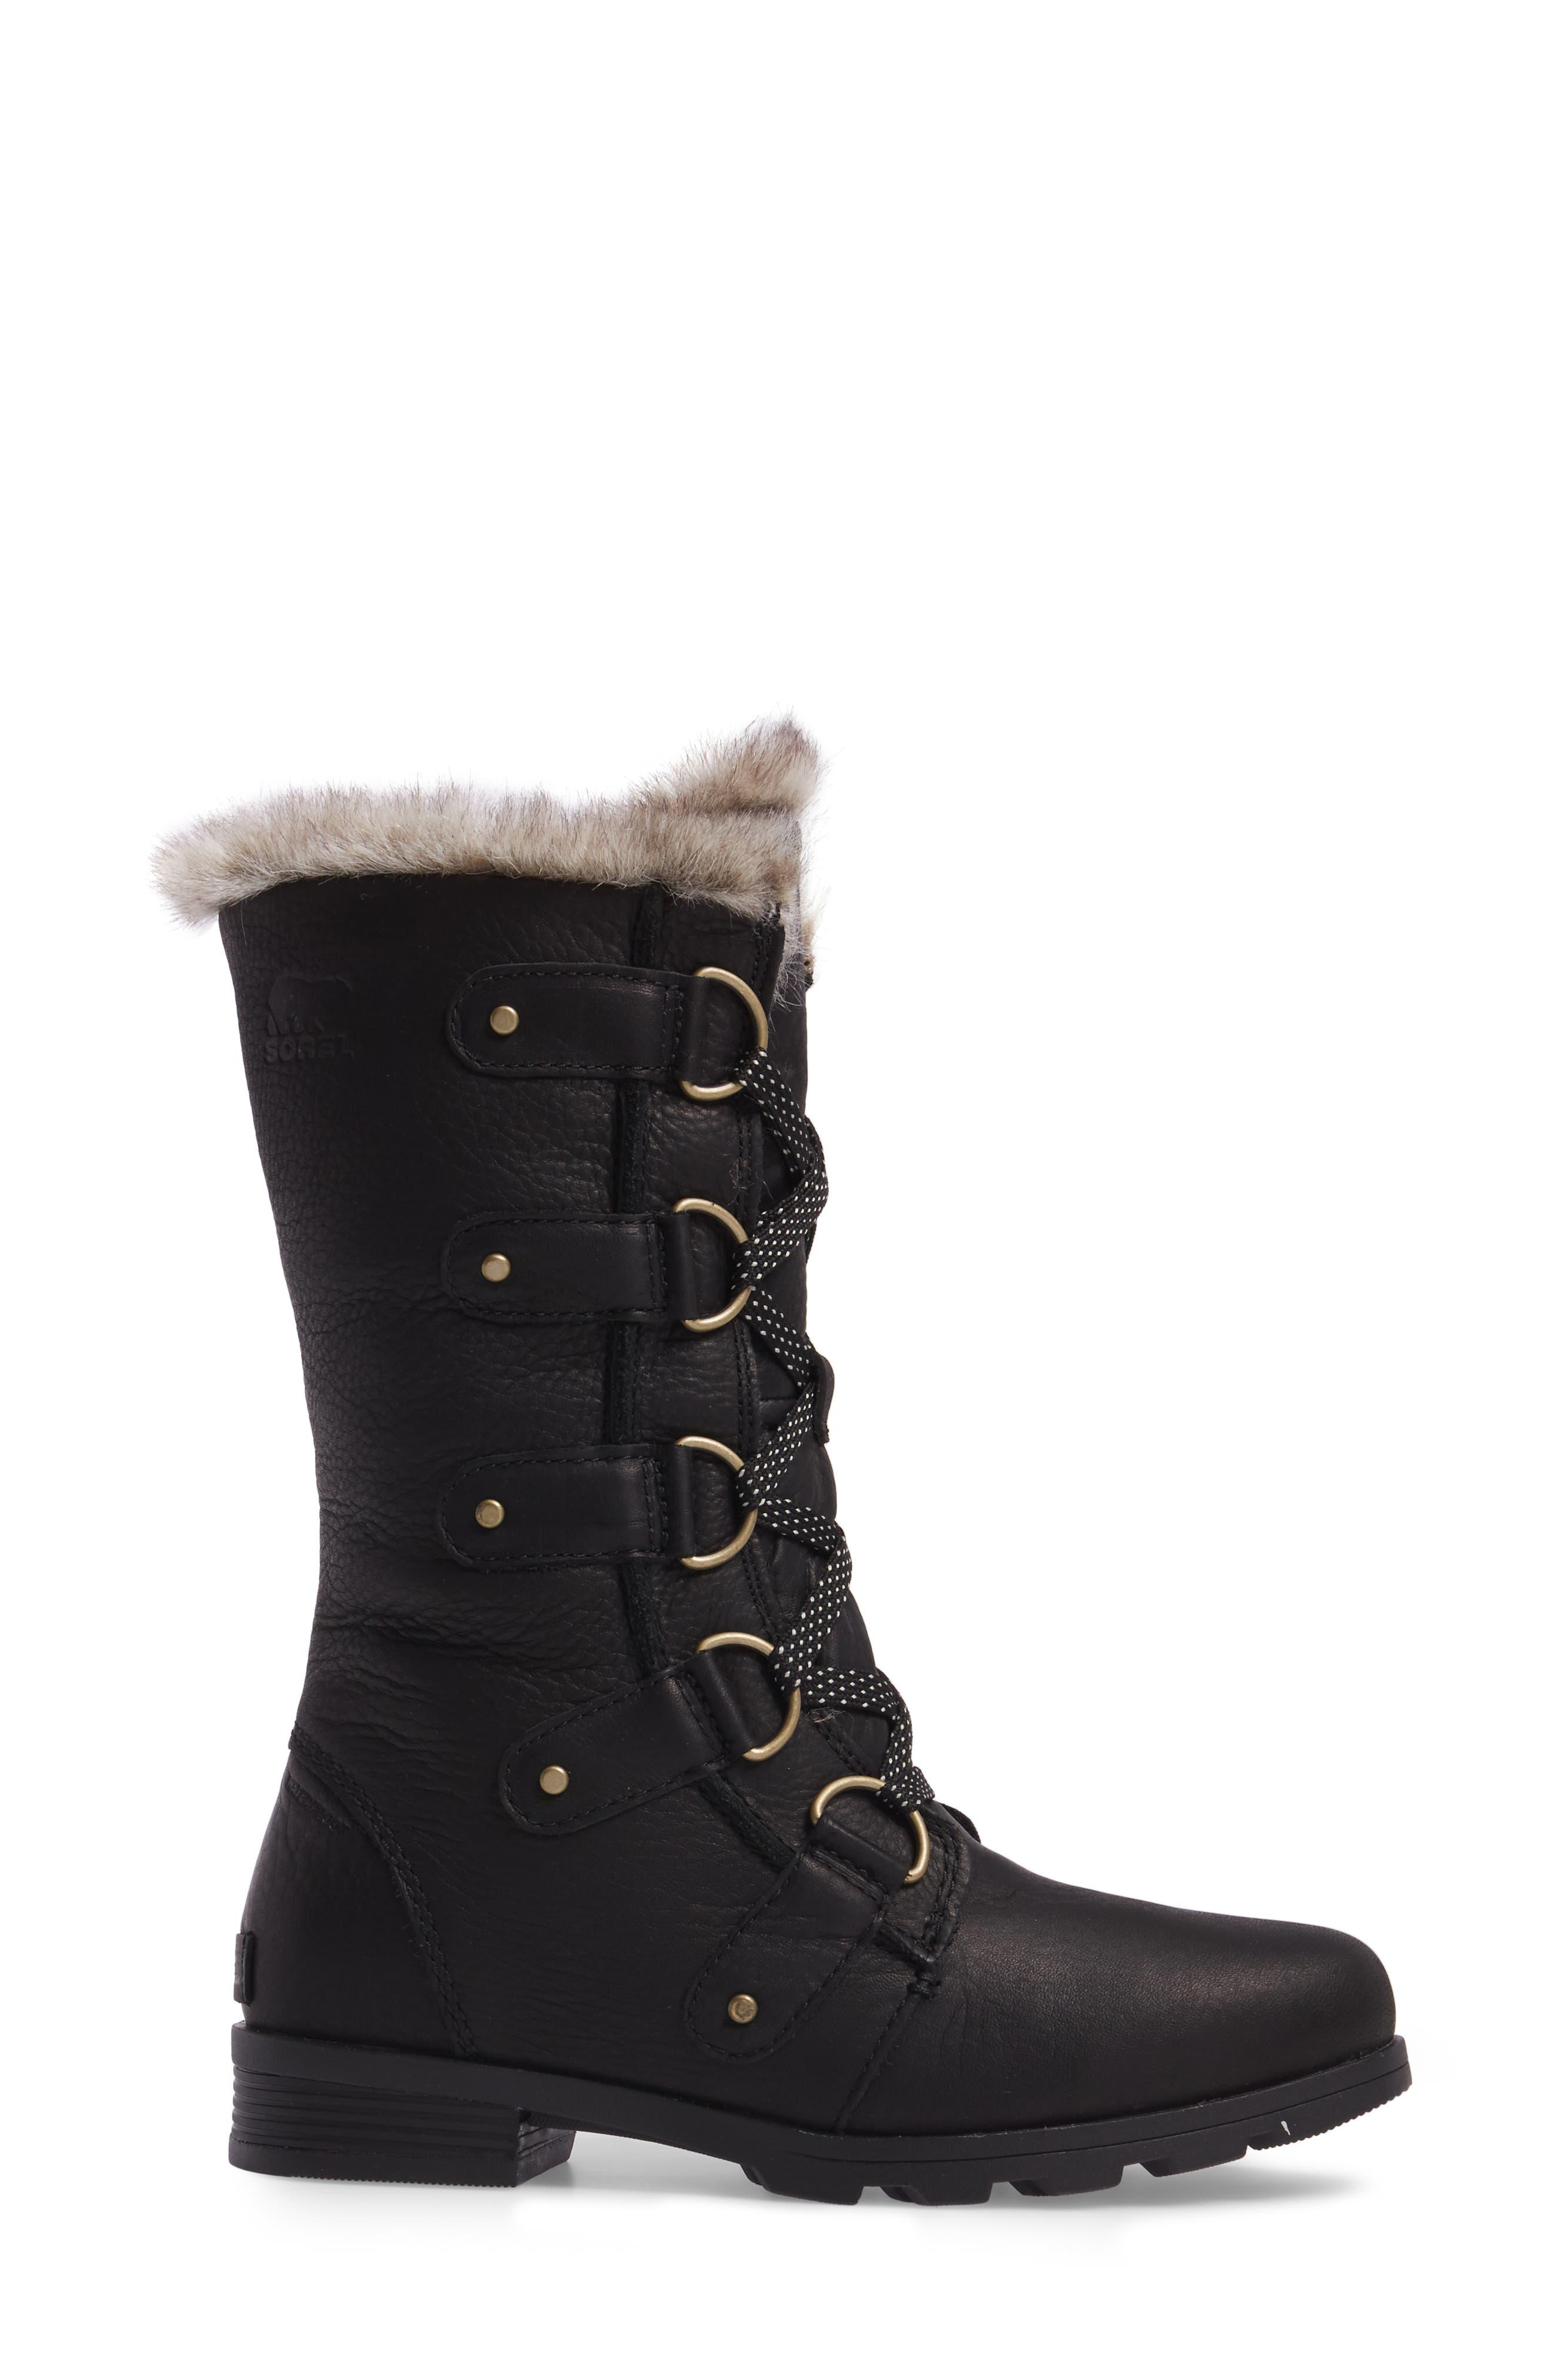 Emelie Waterproof Lace Up Boot with Faux Fur Trim,                             Alternate thumbnail 3, color,                             Black